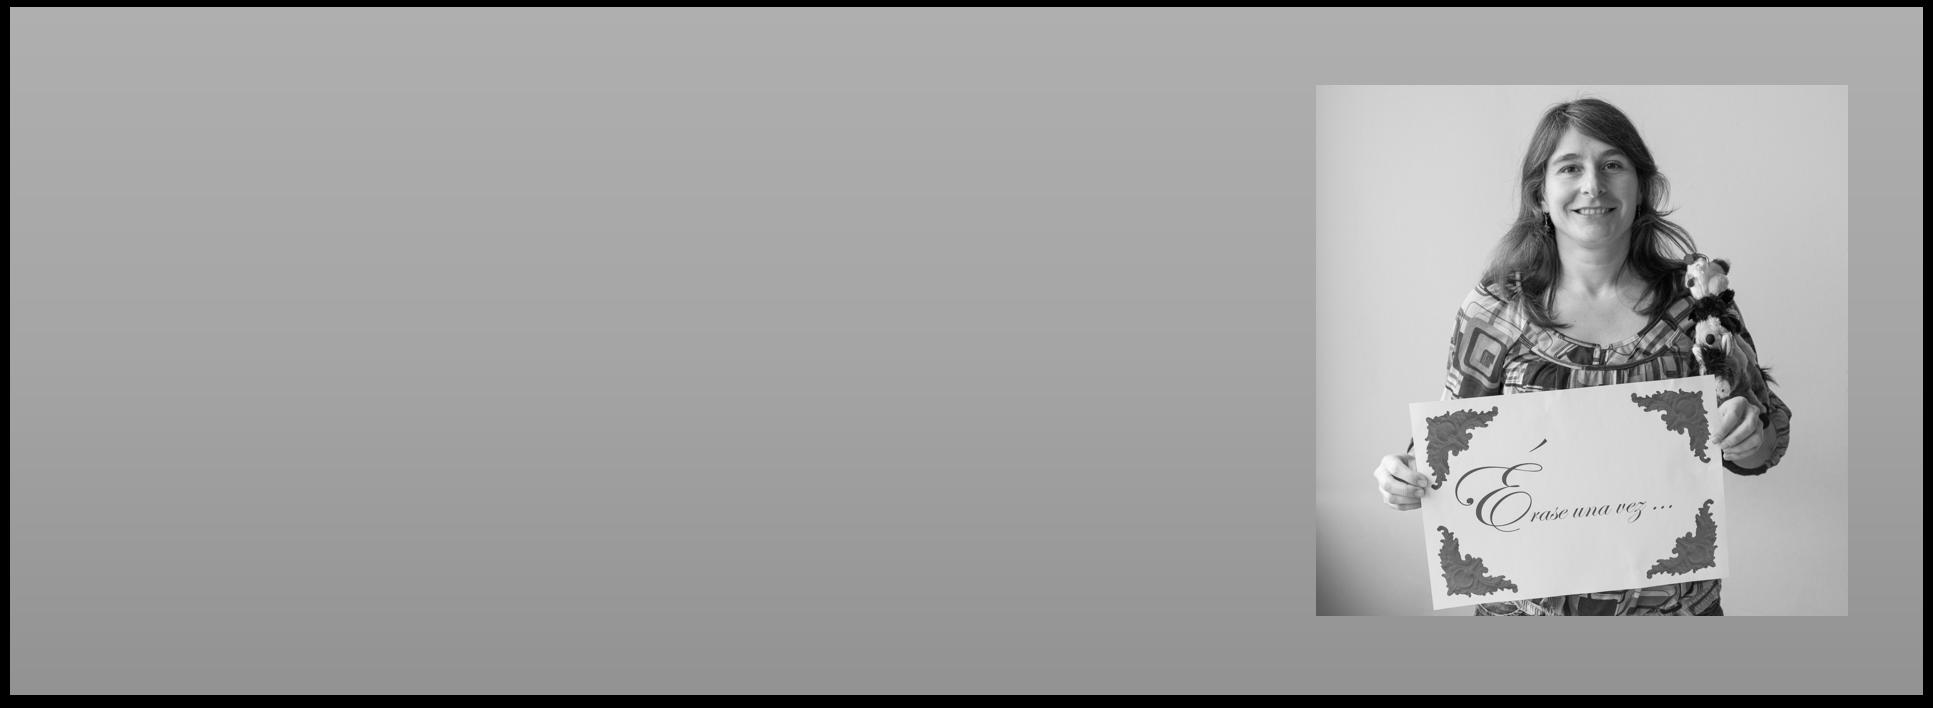 Gema banner